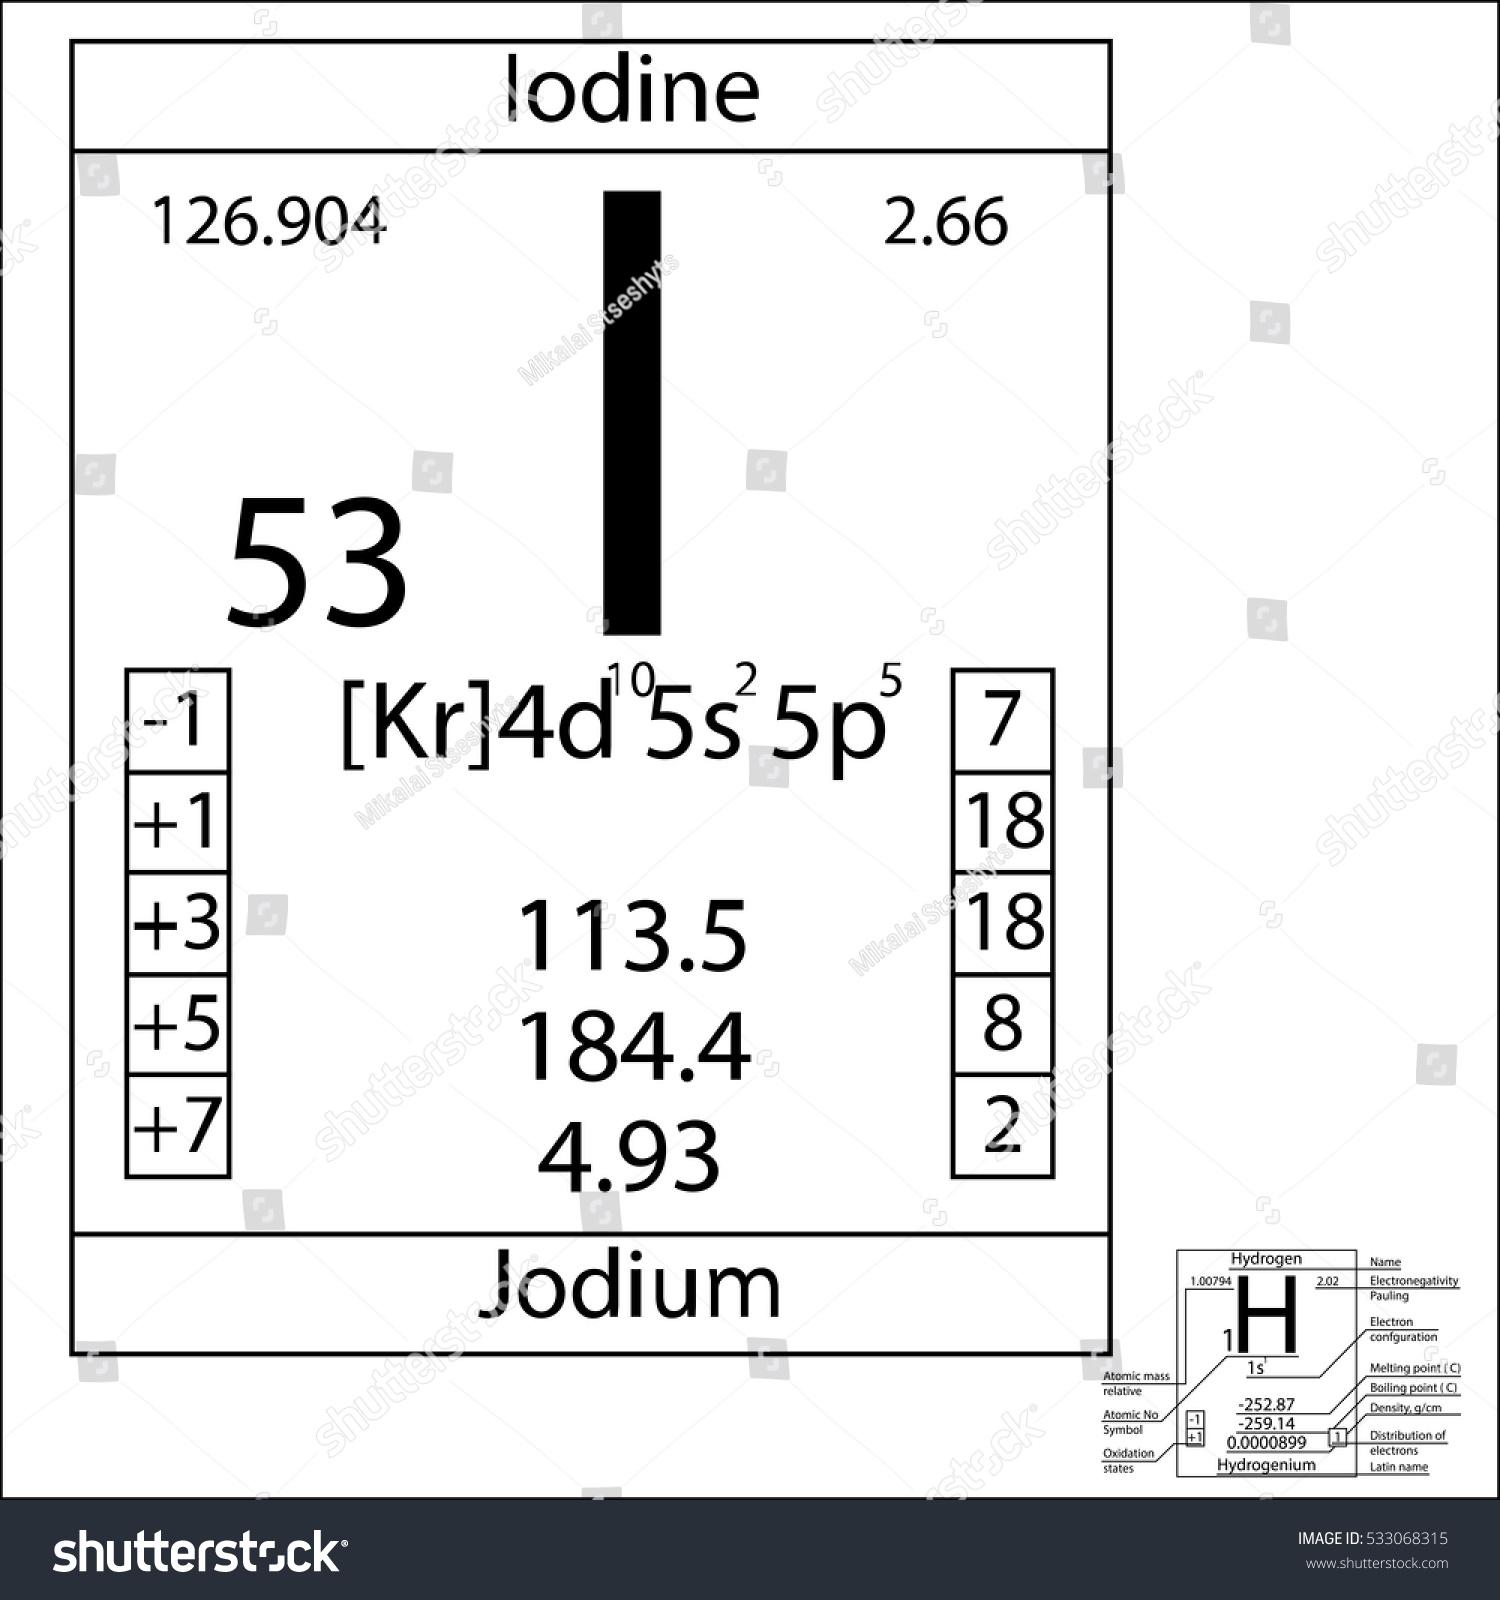 Periodic table element iodine basic properties stock vector the periodic table element iodine with the basic properties gamestrikefo Choice Image